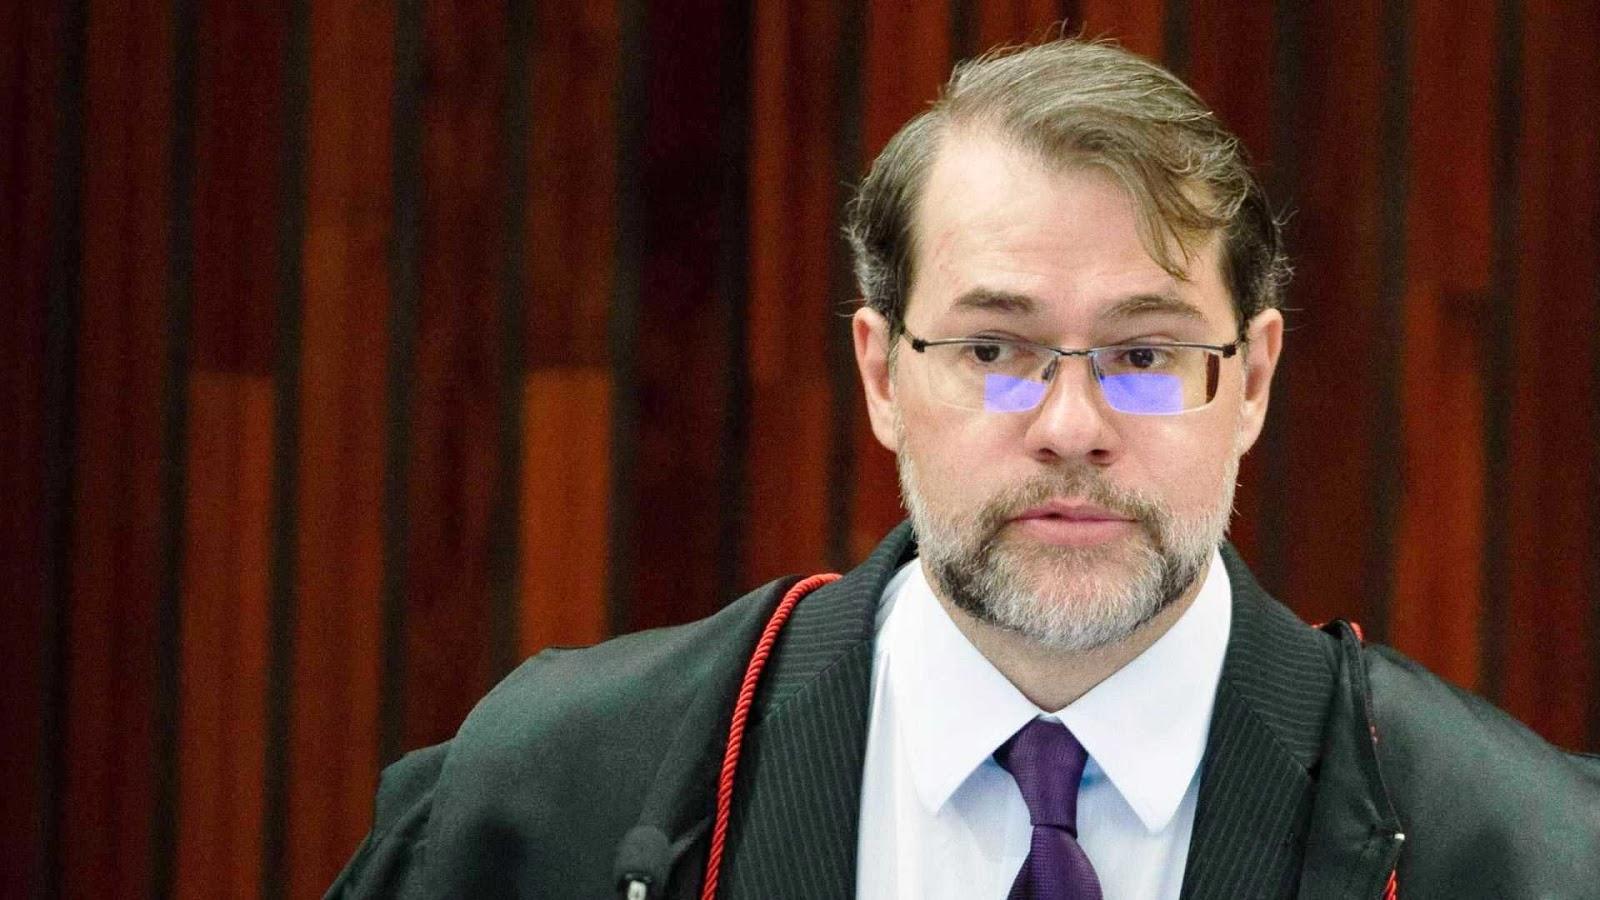 Vídeo: ministro do STF recebe ultimato